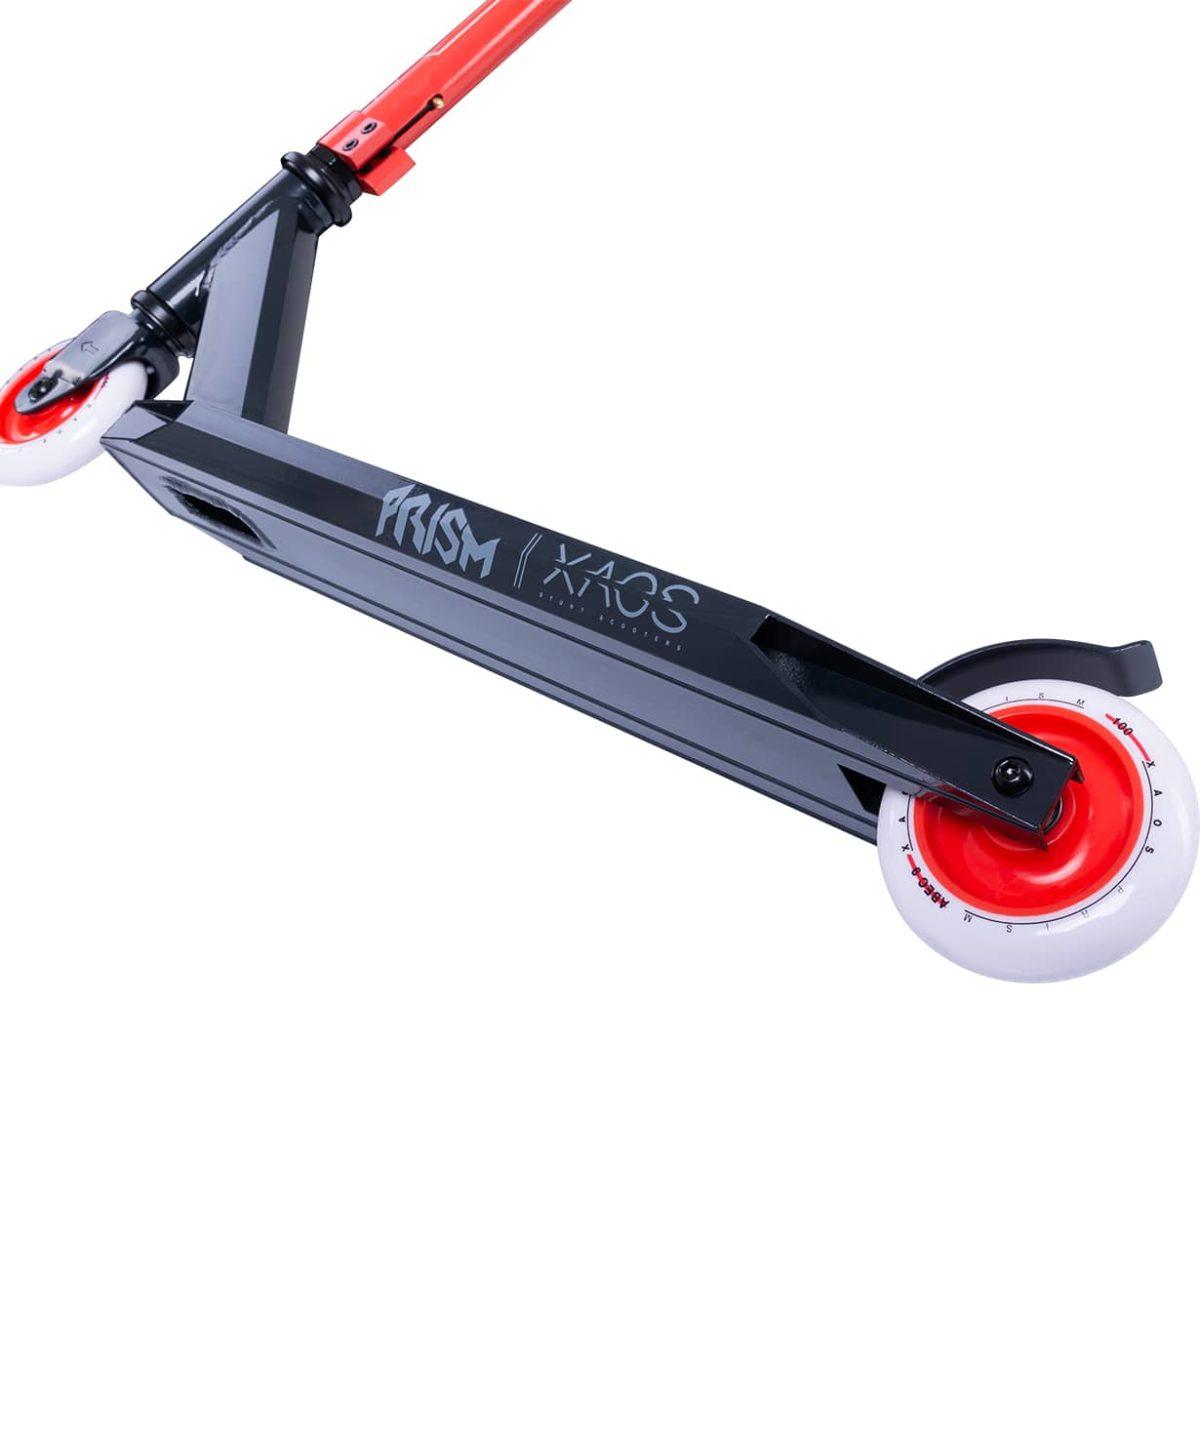 XAOS Prism Cамокат трюковый 100 мм  Prism: Red - 3